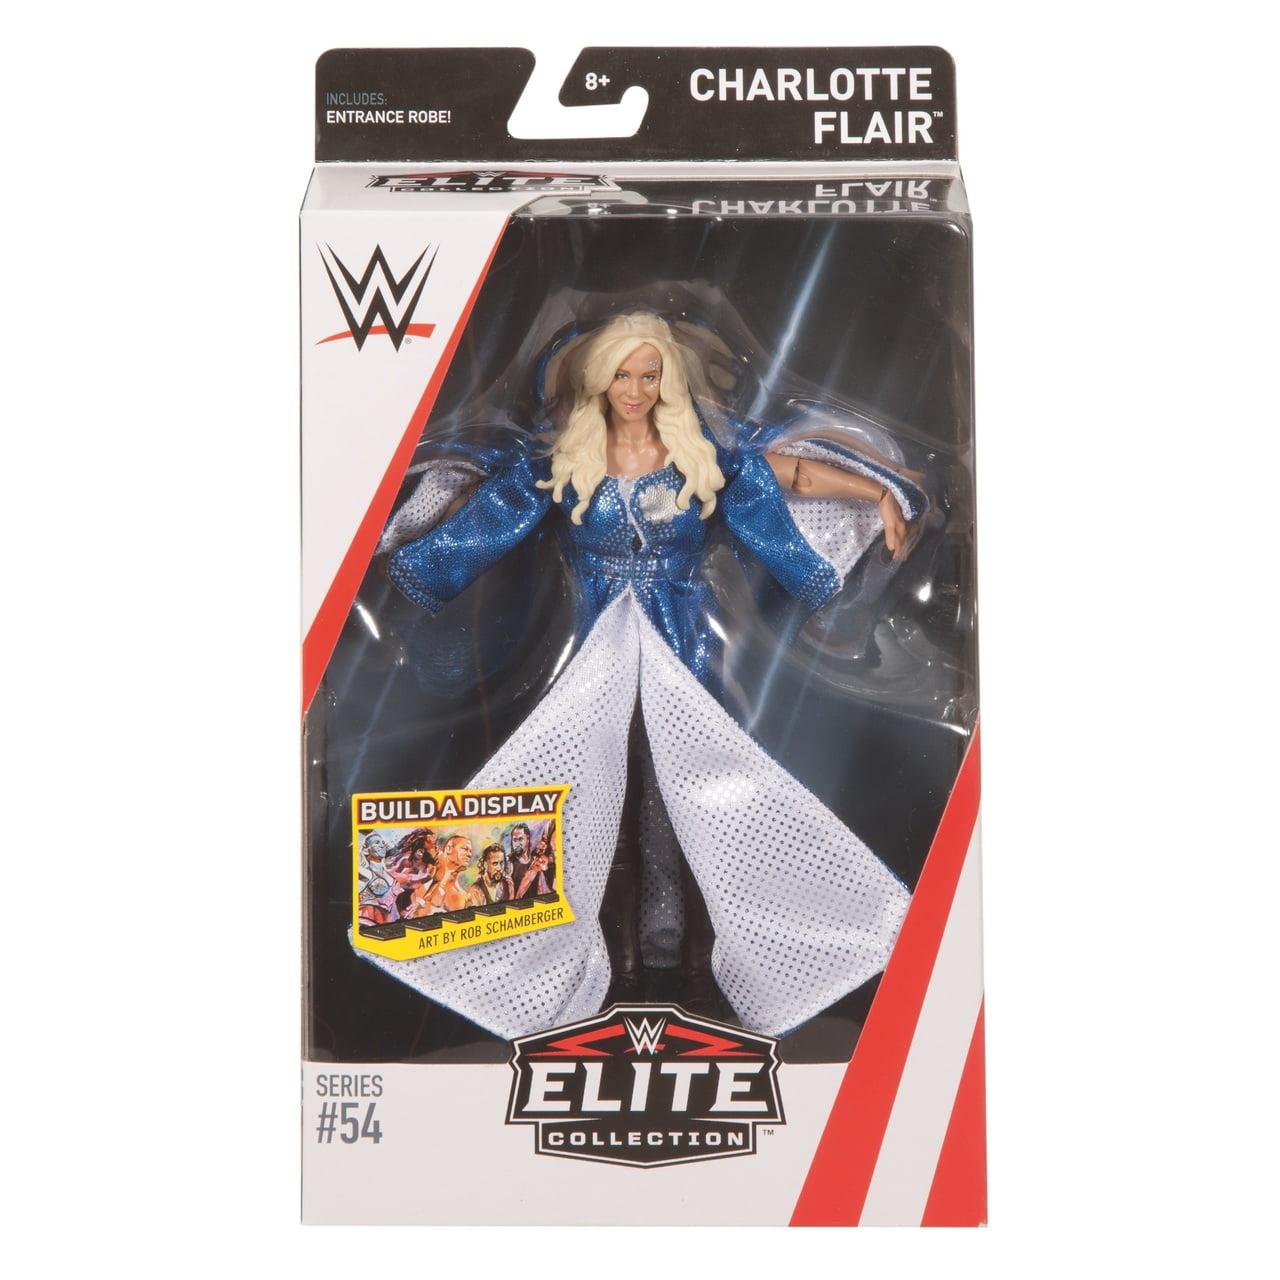 Charlotte Flair WWE Mattel Elite Series 54 Action Figure by Mattel